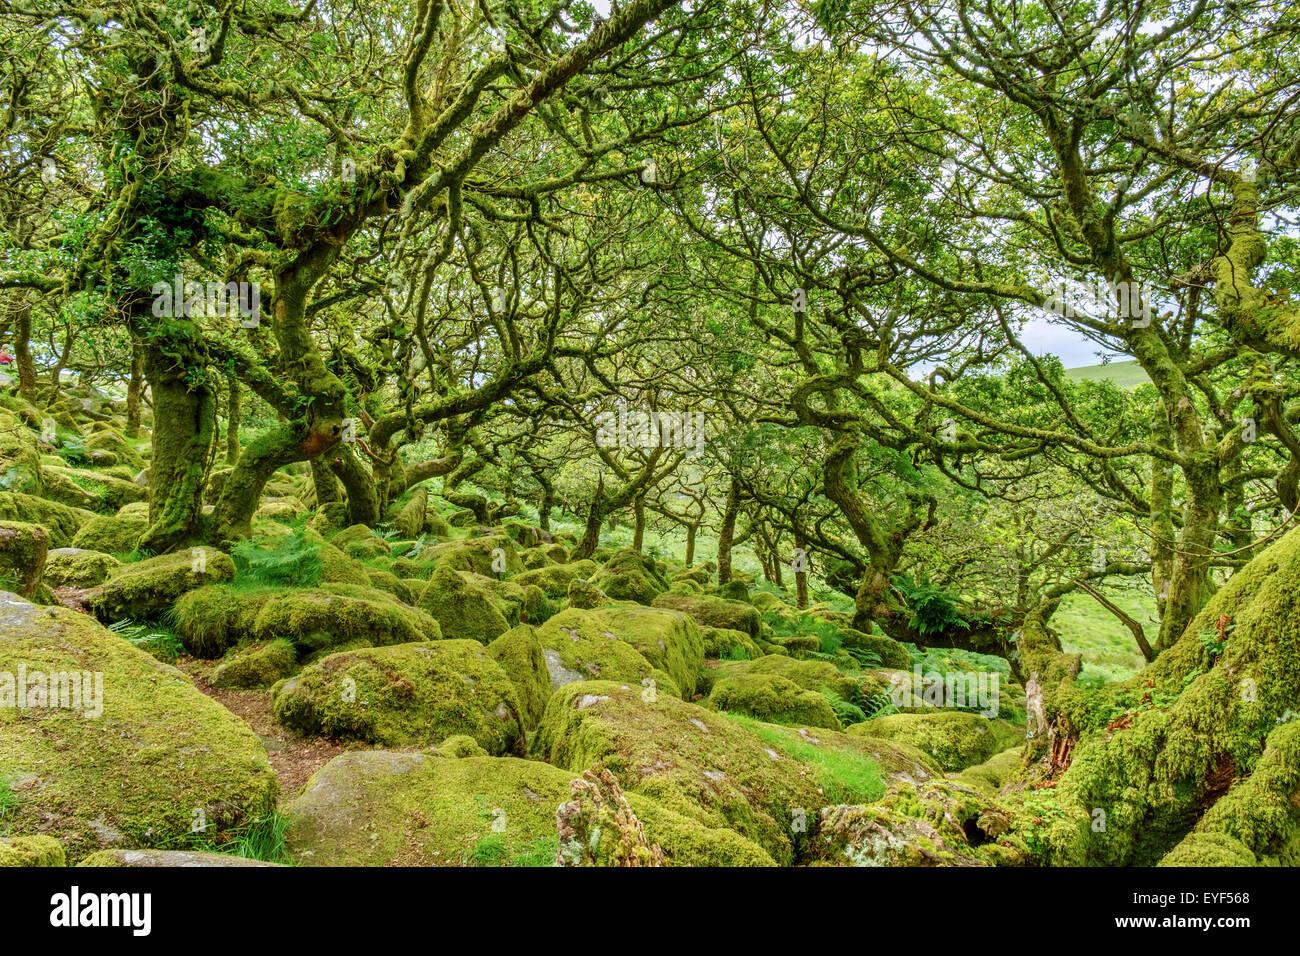 Wistman's Wood, un robledal de gran altitud (Quercus robur), cerca de dos puentes, el parque nacional de Dartmoor, Imagen De Stock